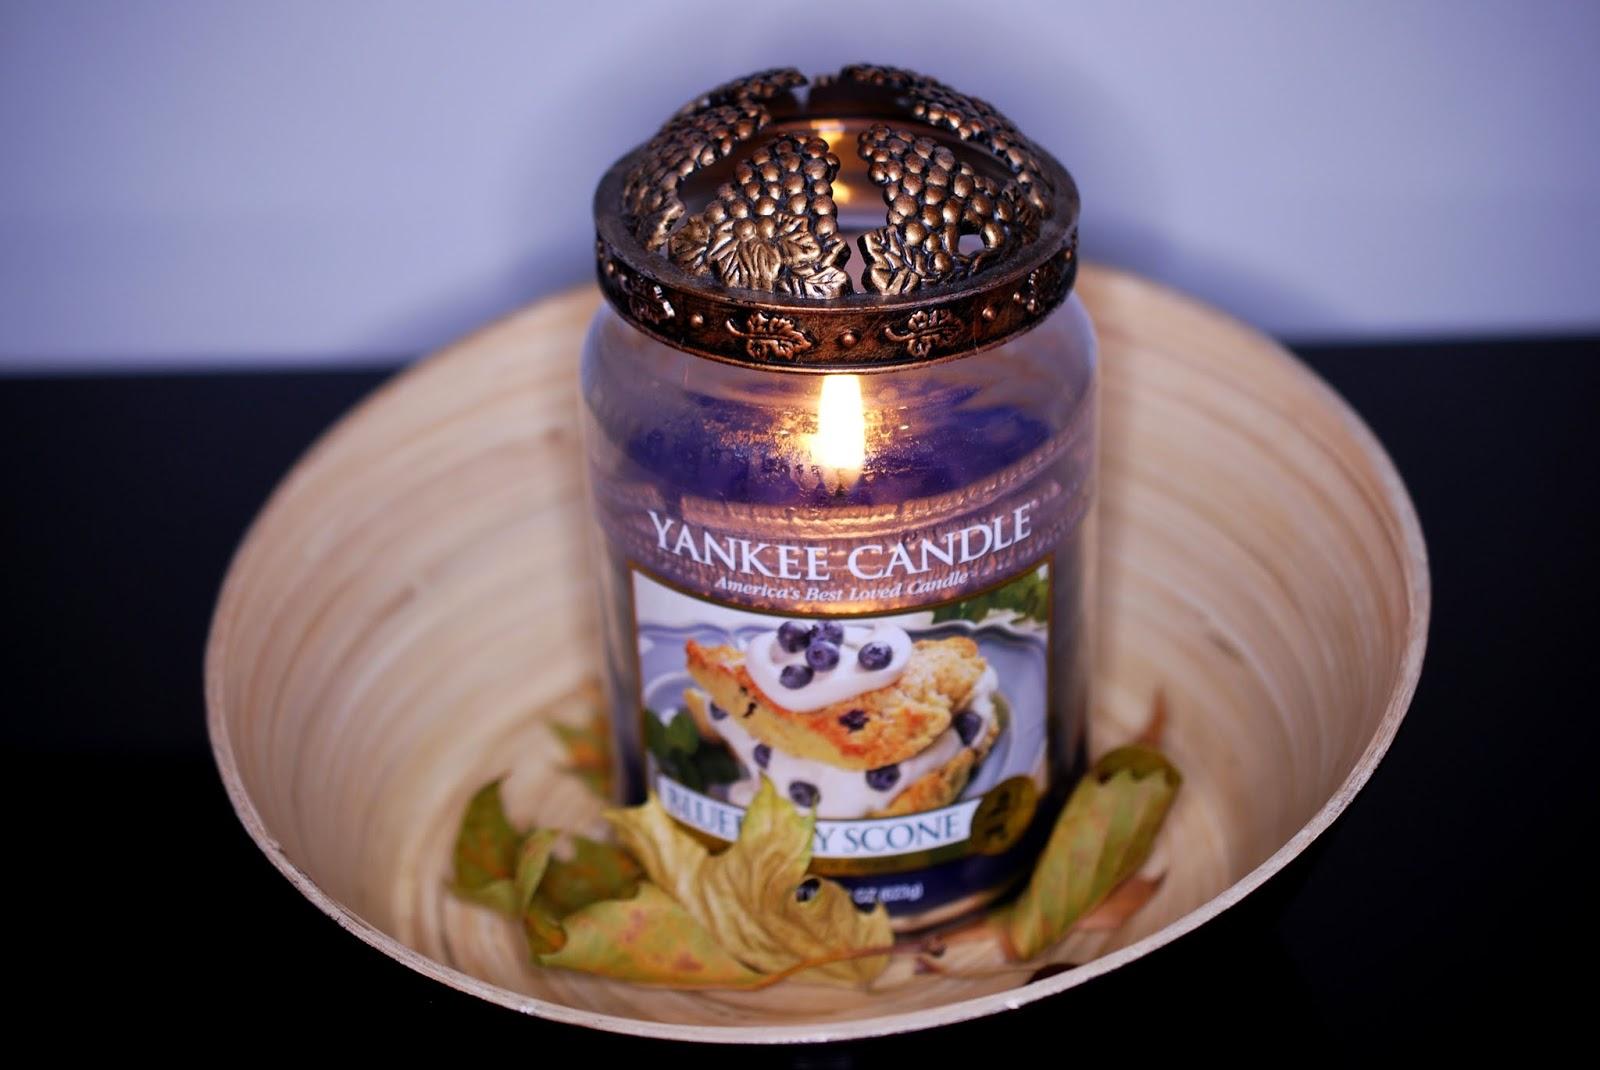 Lieblingskerze im Herbst: Yankee Candle Blueberry Scone